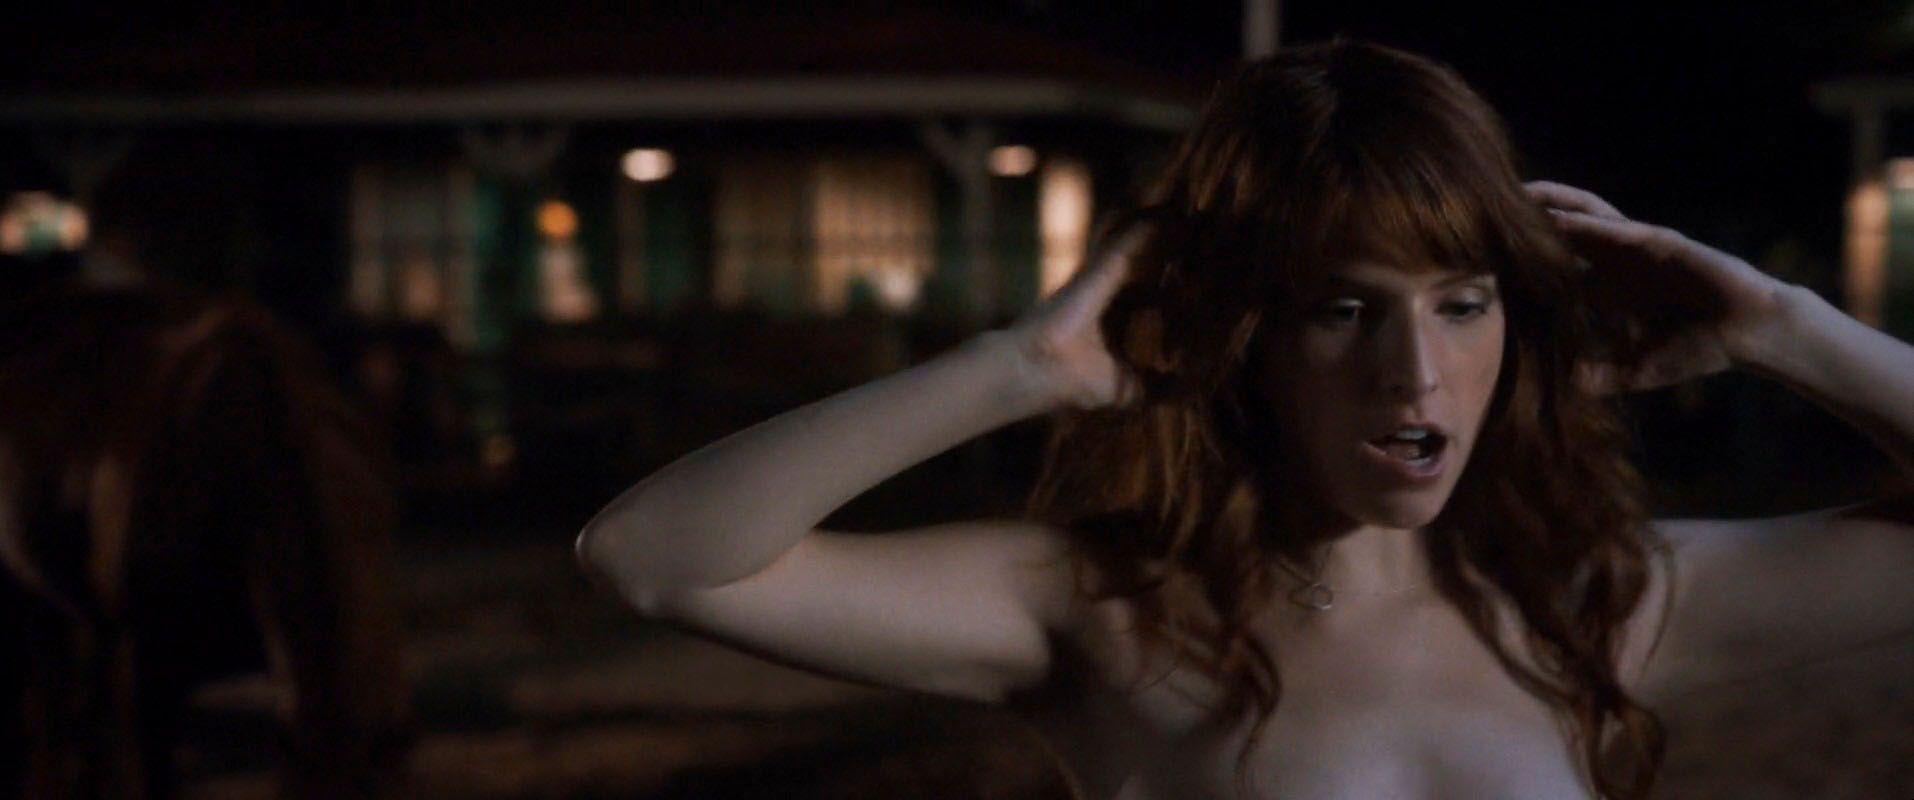 Aubrey Plaza leaked nude pic